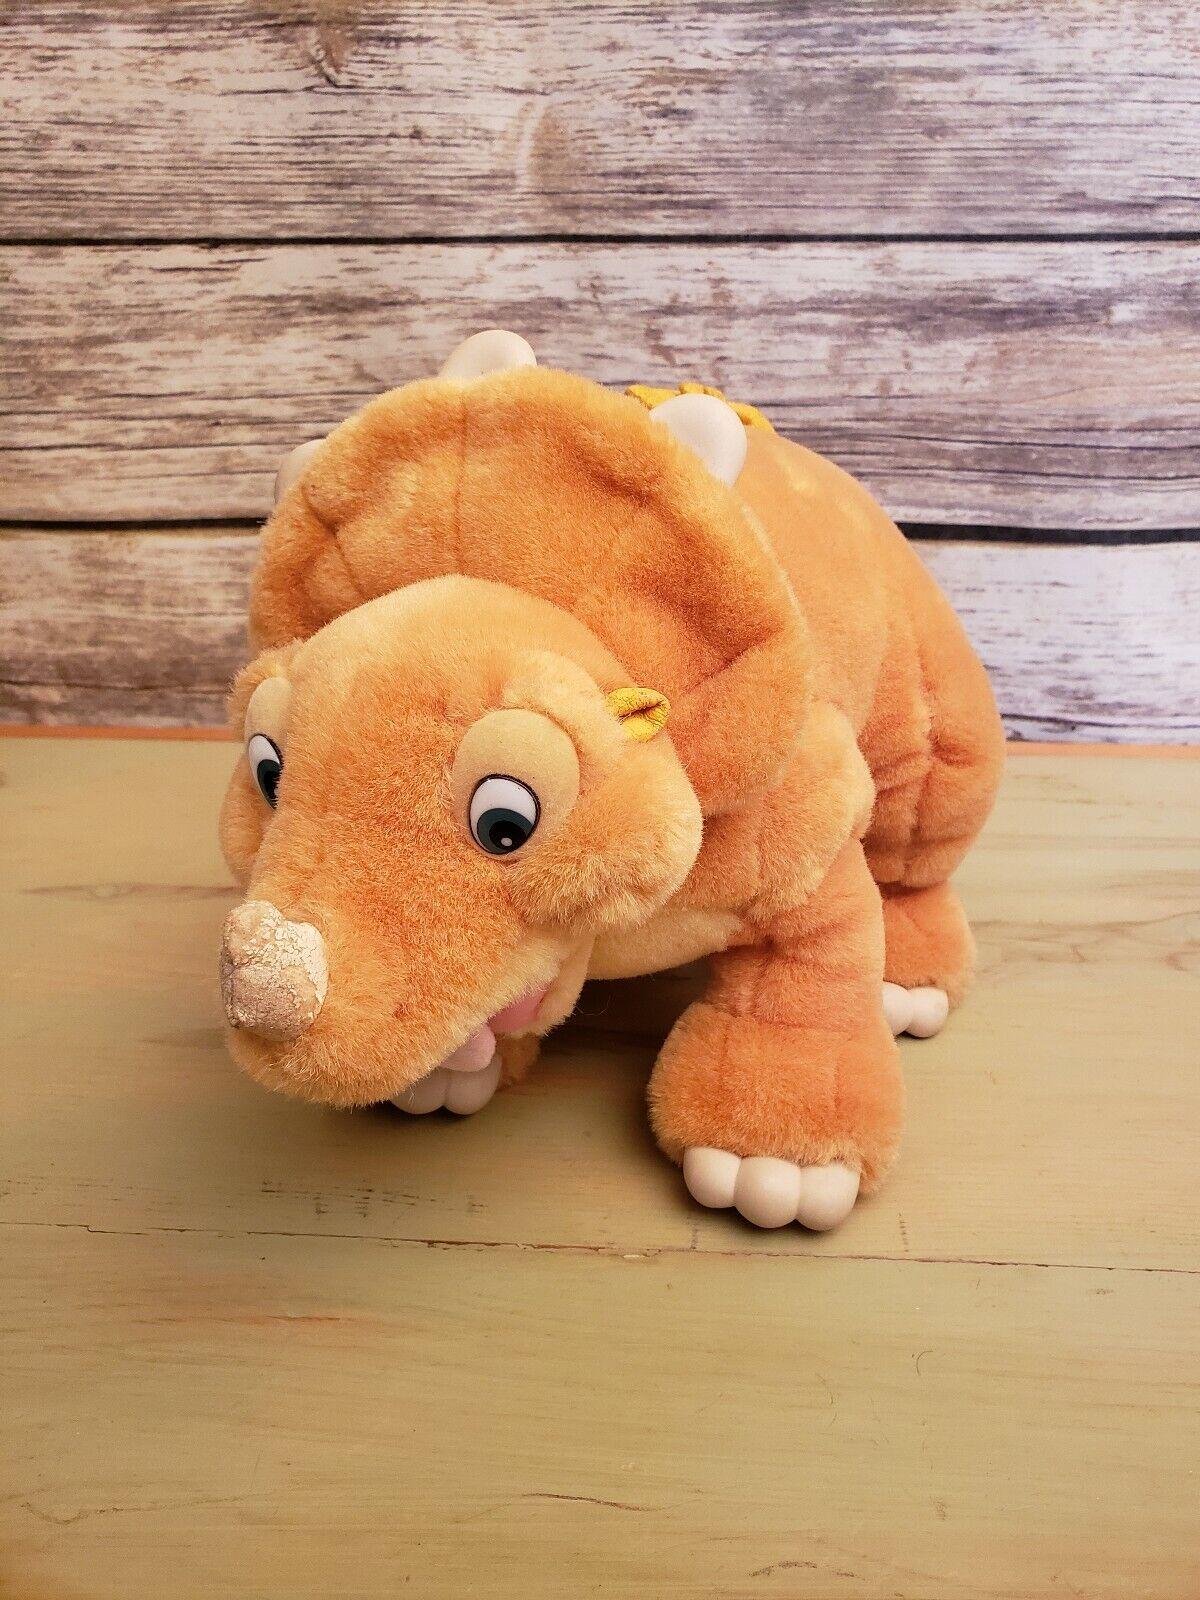 "1988 The Land Before Time Cera Plush Dinosaur Stuffed Animal Toy JC Penney - 15"""